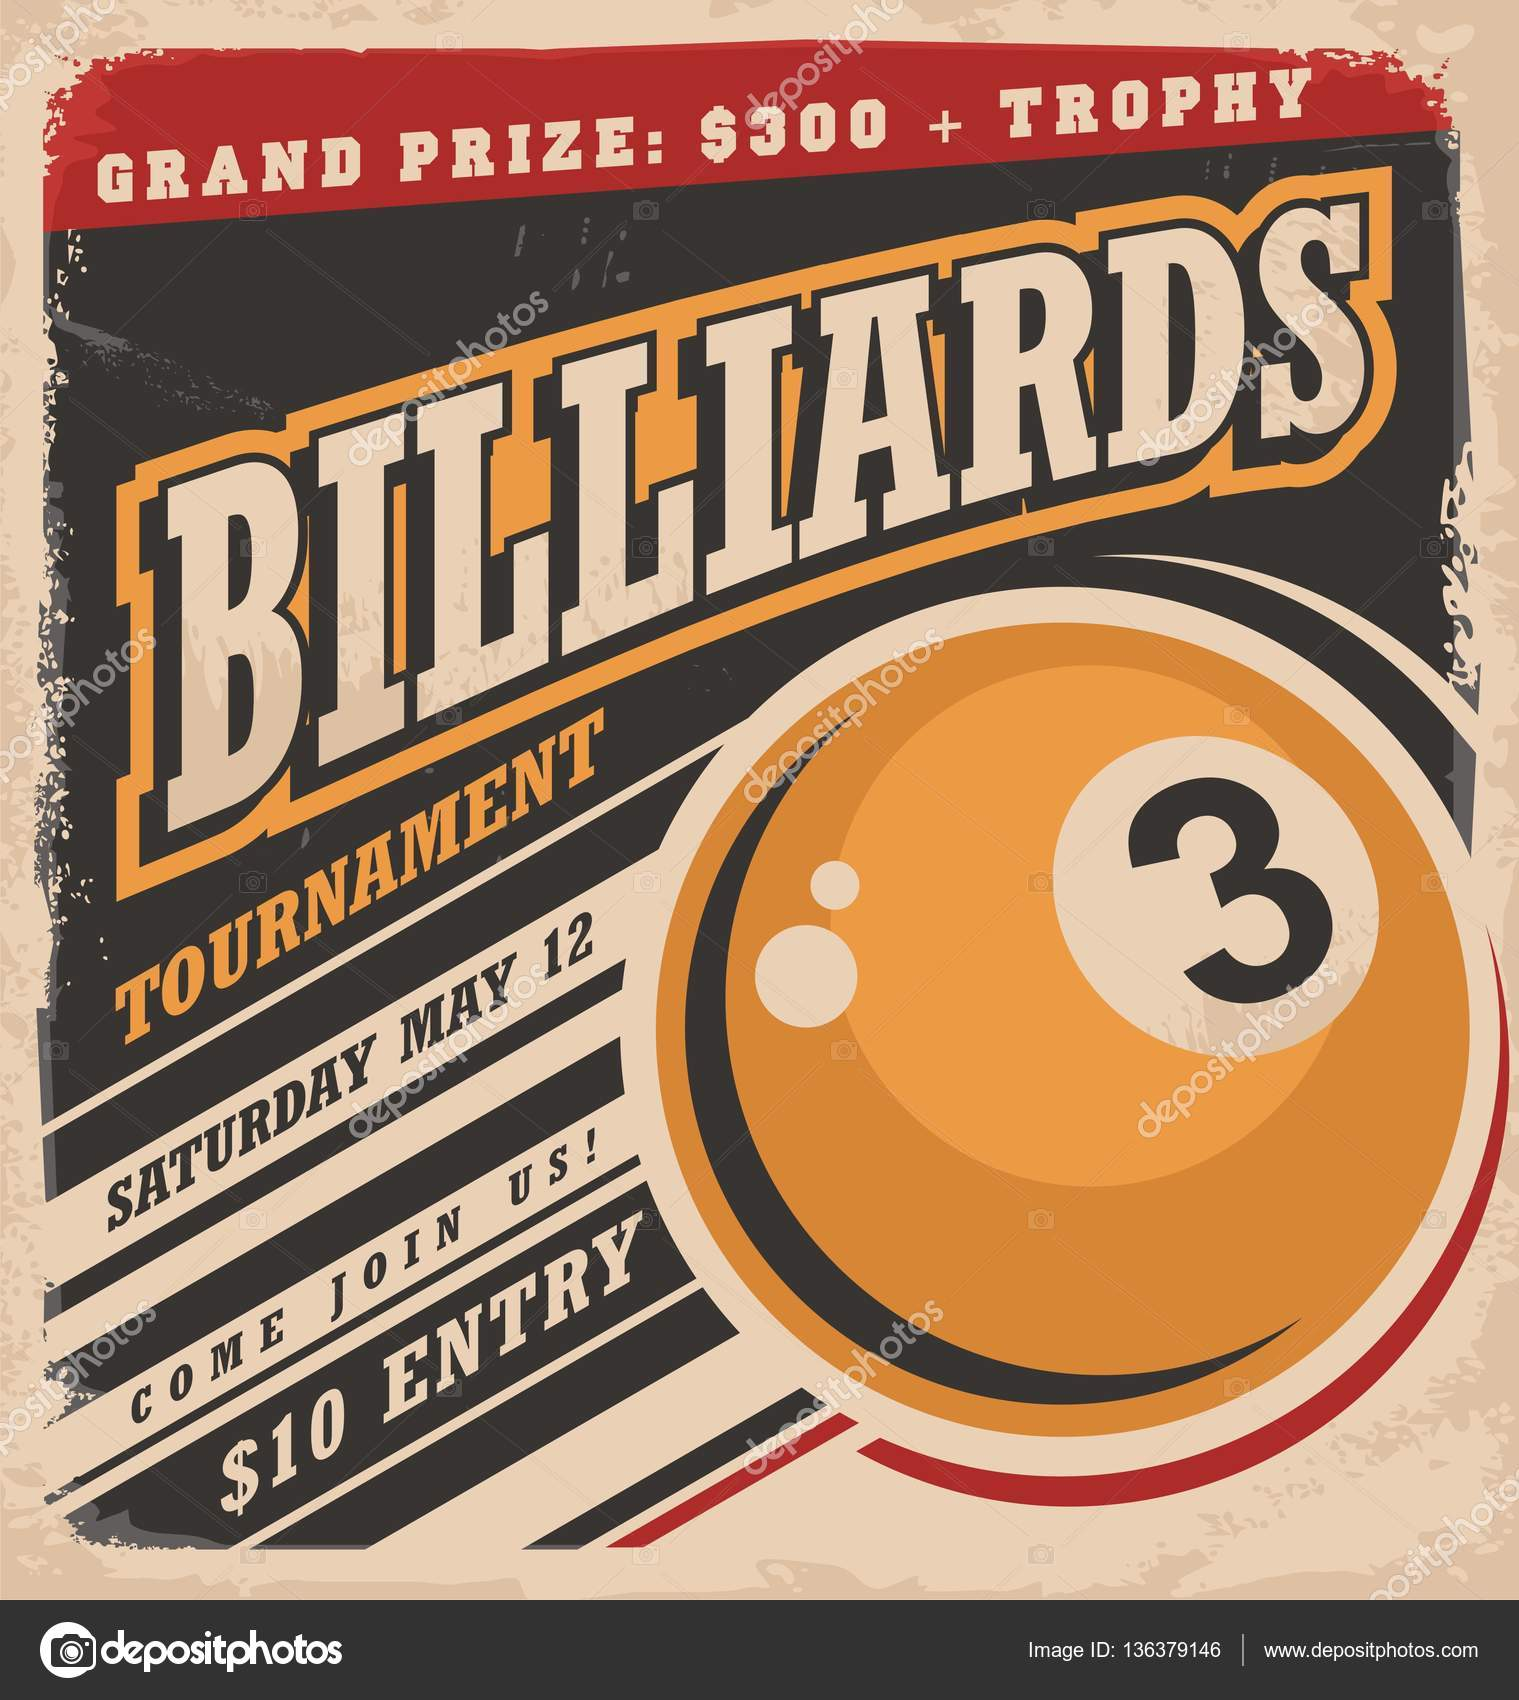 Poster design layout - Billiards Retro Poster Design Layout Stock Vector 136379146